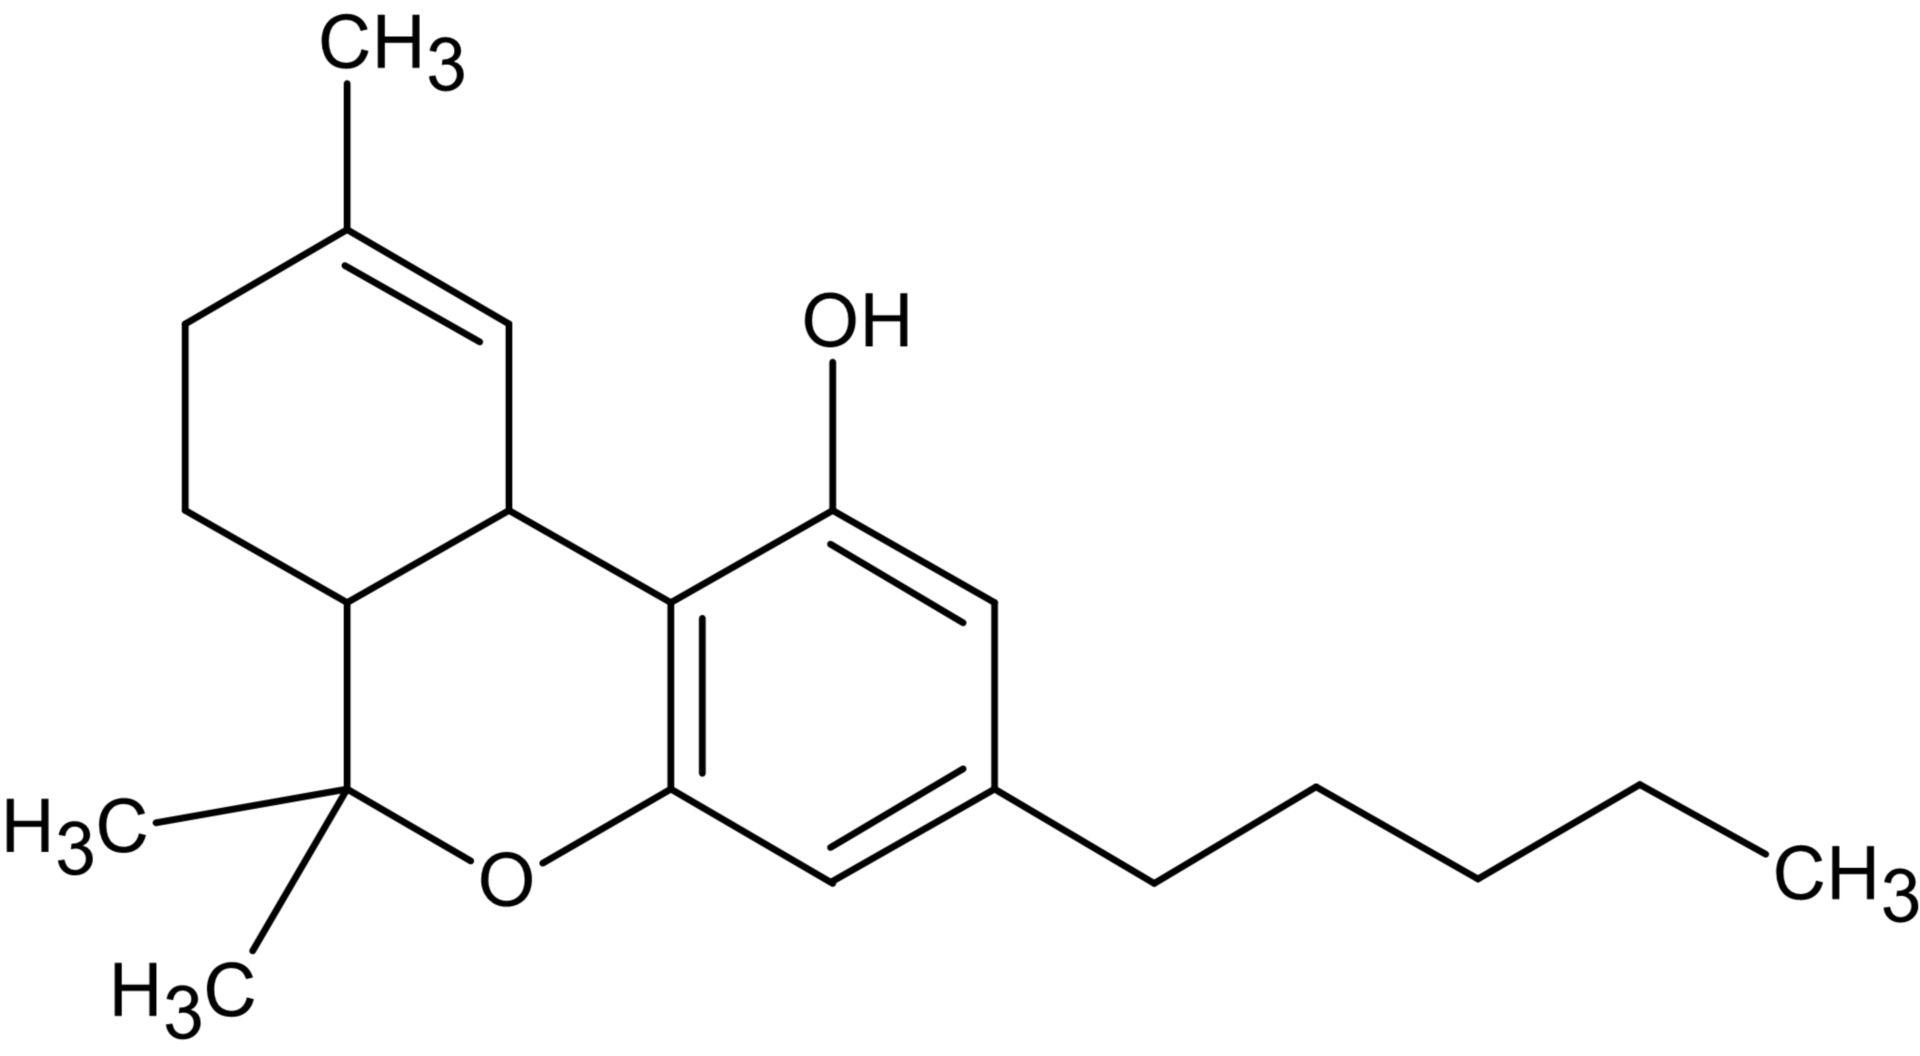 Strukturformel Tetrahydrocannabinol